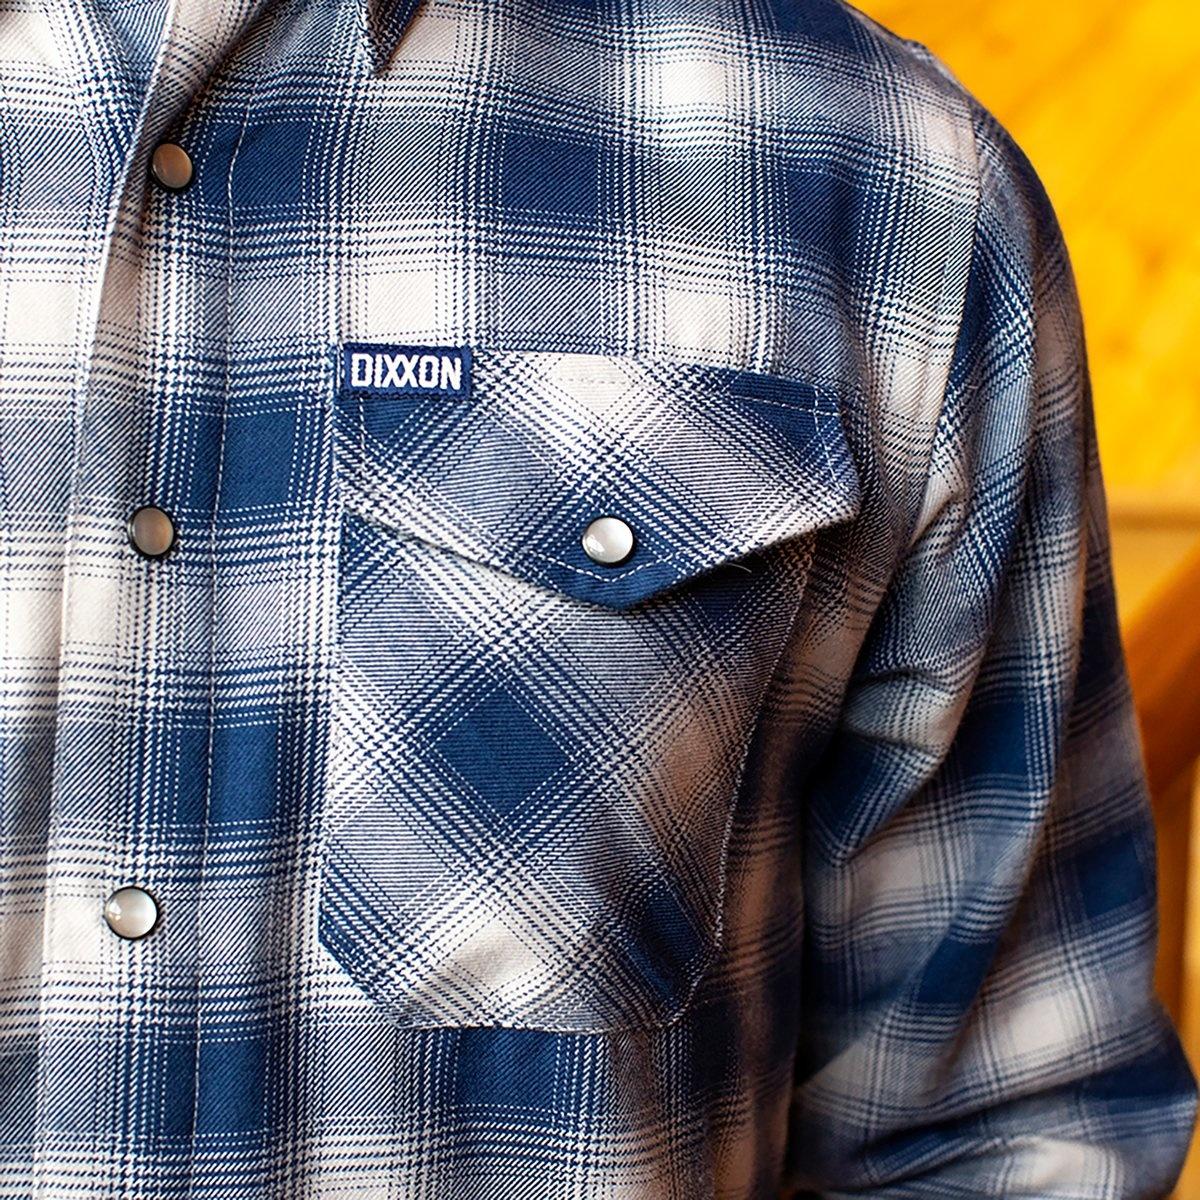 Dixxon Dixxon - Midway Flannel